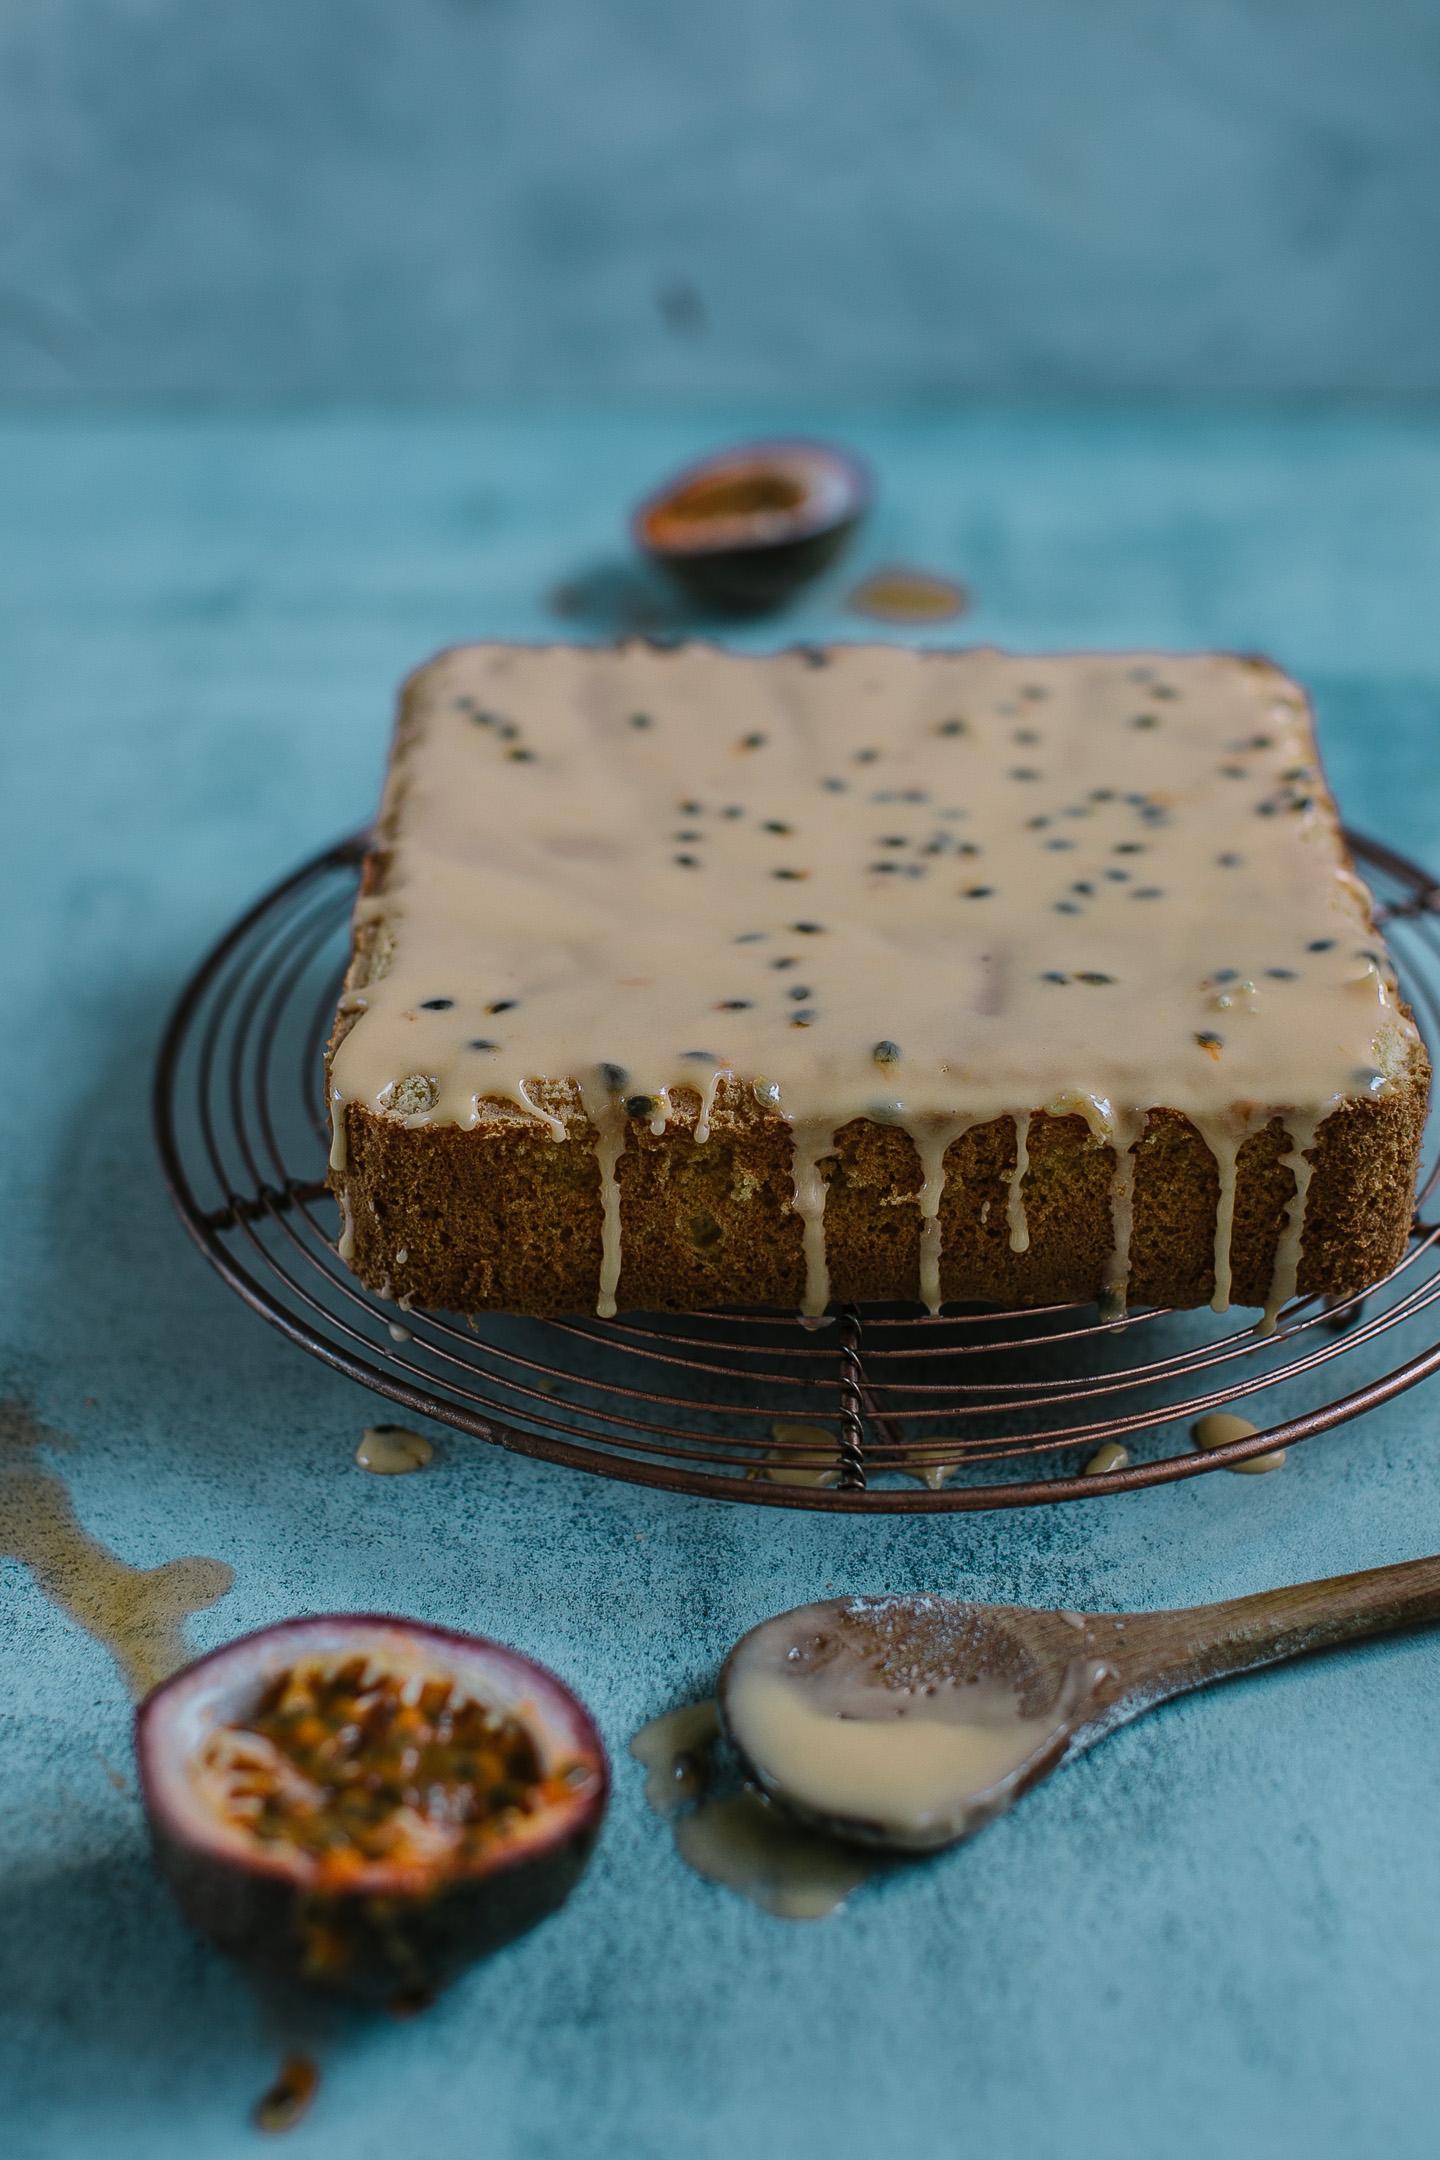 Gluten and dairy free passionfruit sponge cake recipe